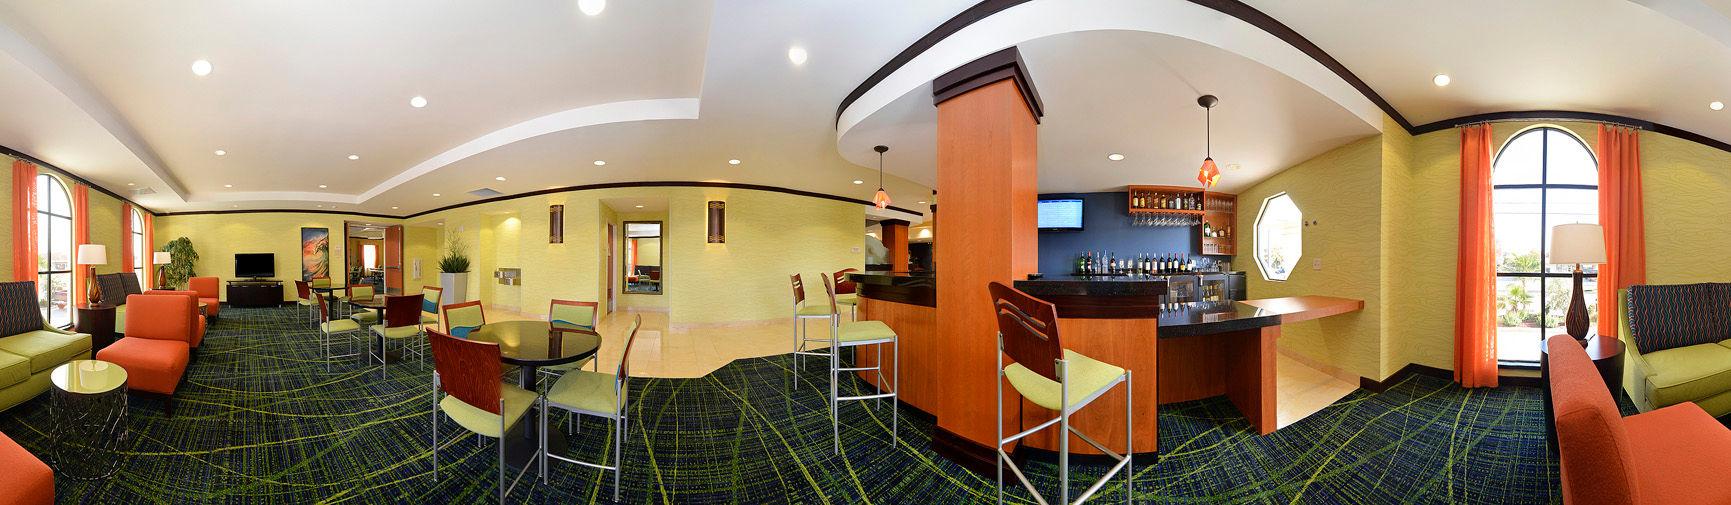 Fairfield Inn & Suites by Marriott Santa Cruz - Capitola image 6